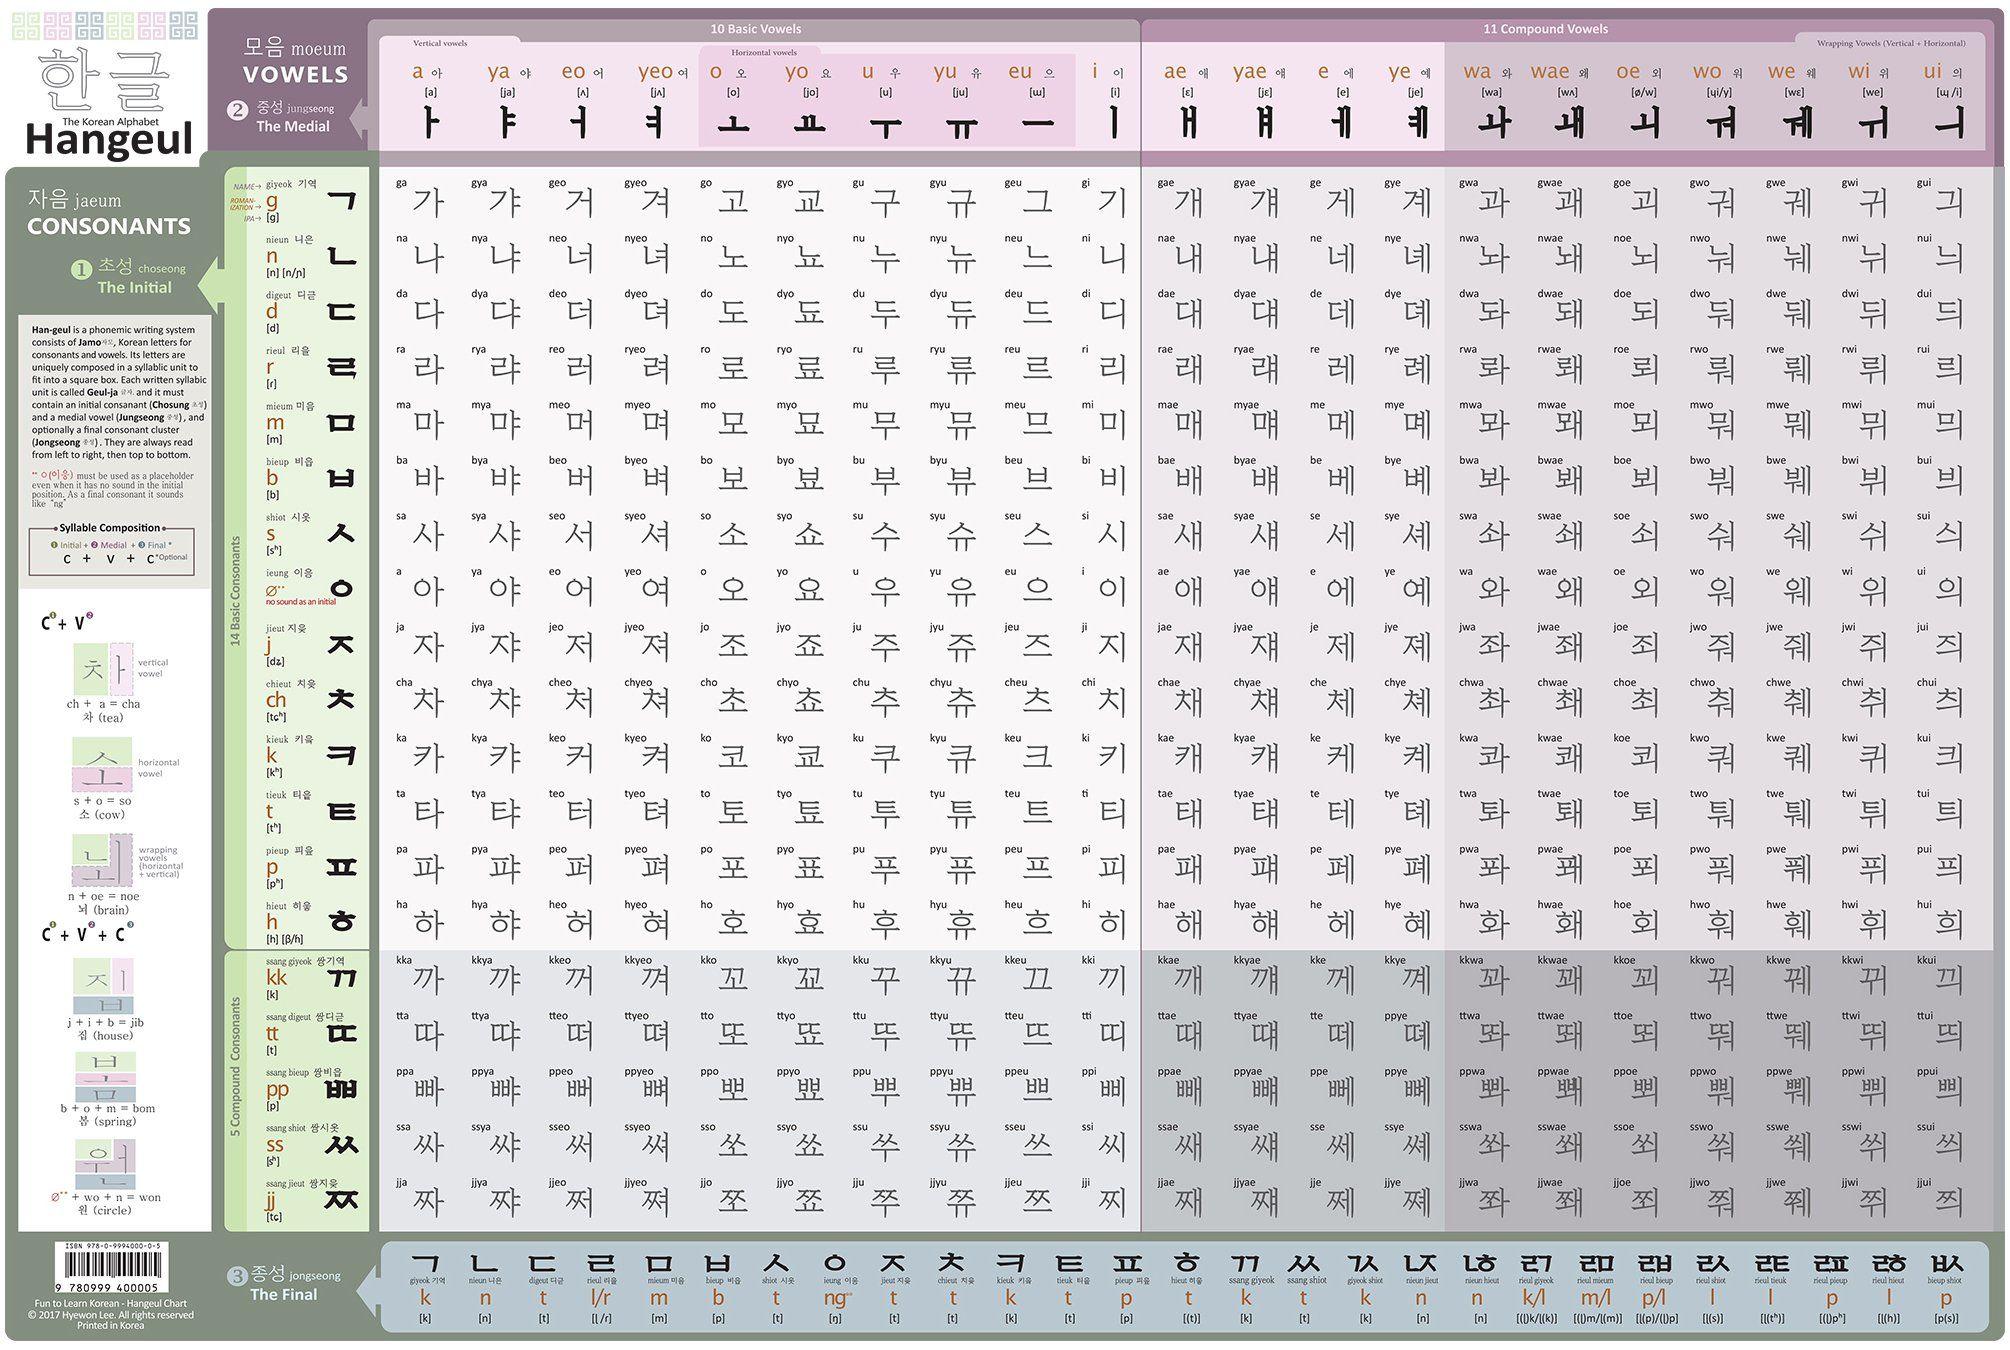 Fun To Learn Korean Hangeul Reading Chart 24x16 Inch Poster Learn Korean Korean Alphabet Hangeul Hangul writing practice sheets